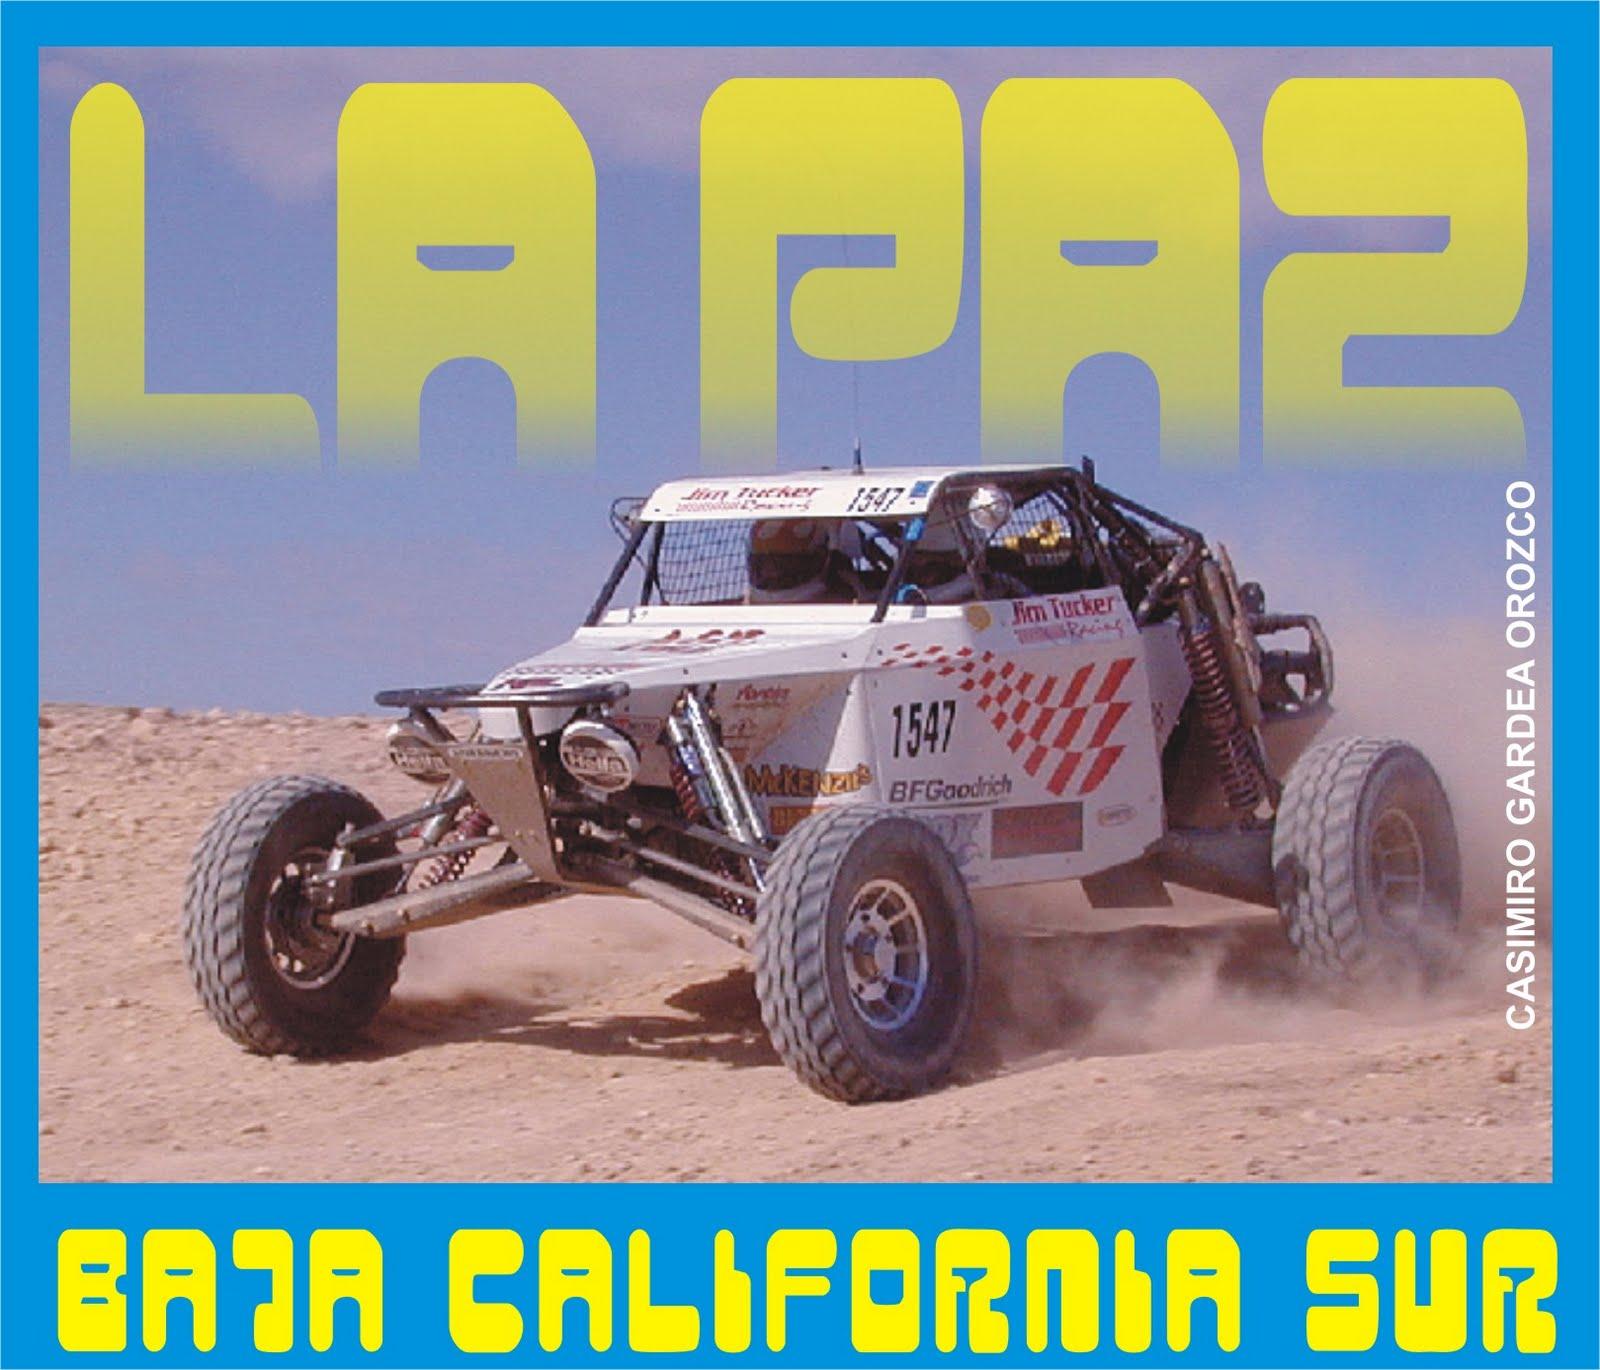 http://3.bp.blogspot.com/-RbZM1vzqE3E/TZPwDjhX-KI/AAAAAAAAJKI/4HmeqBfpDk8/s1600/LA+PAZ,+BAJA+CALIFORNIA+SUR,+AUTOS,+BAJA+MIL,+CAMINOS,+WALLPAPER,+FONDOS,+TEXTURAS,+CANCER,+DIABETES,+SONORA,+SINALOA.jpg